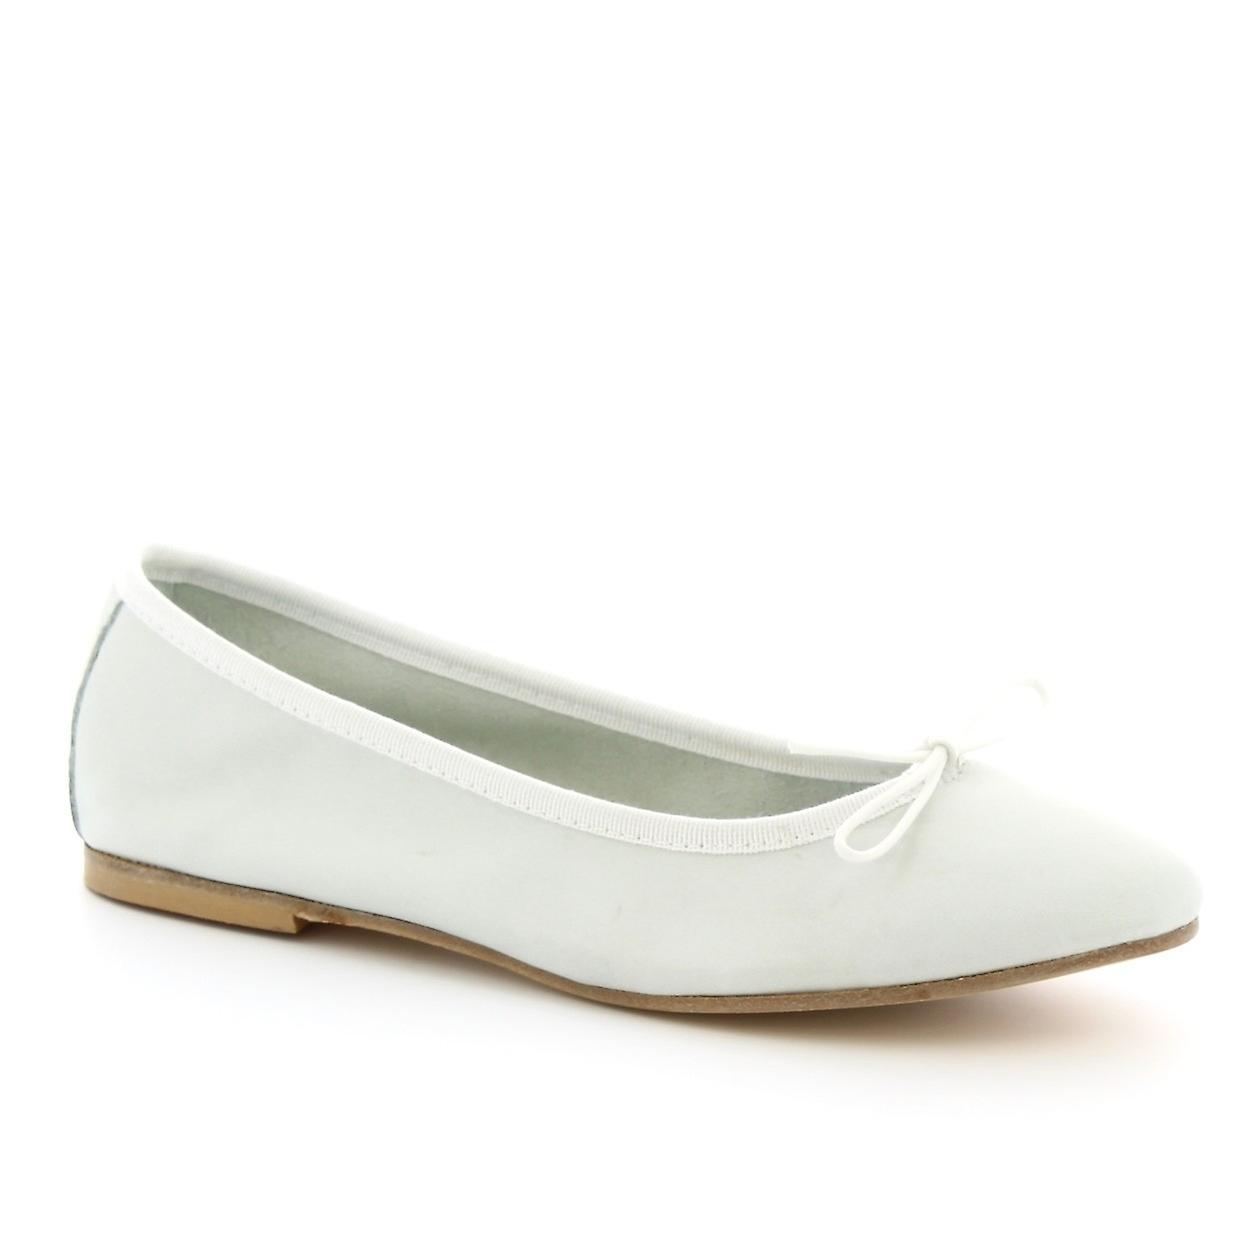 Leonardo Shoes Women's handmade ballet flats shoes in white calf leather QGUYz